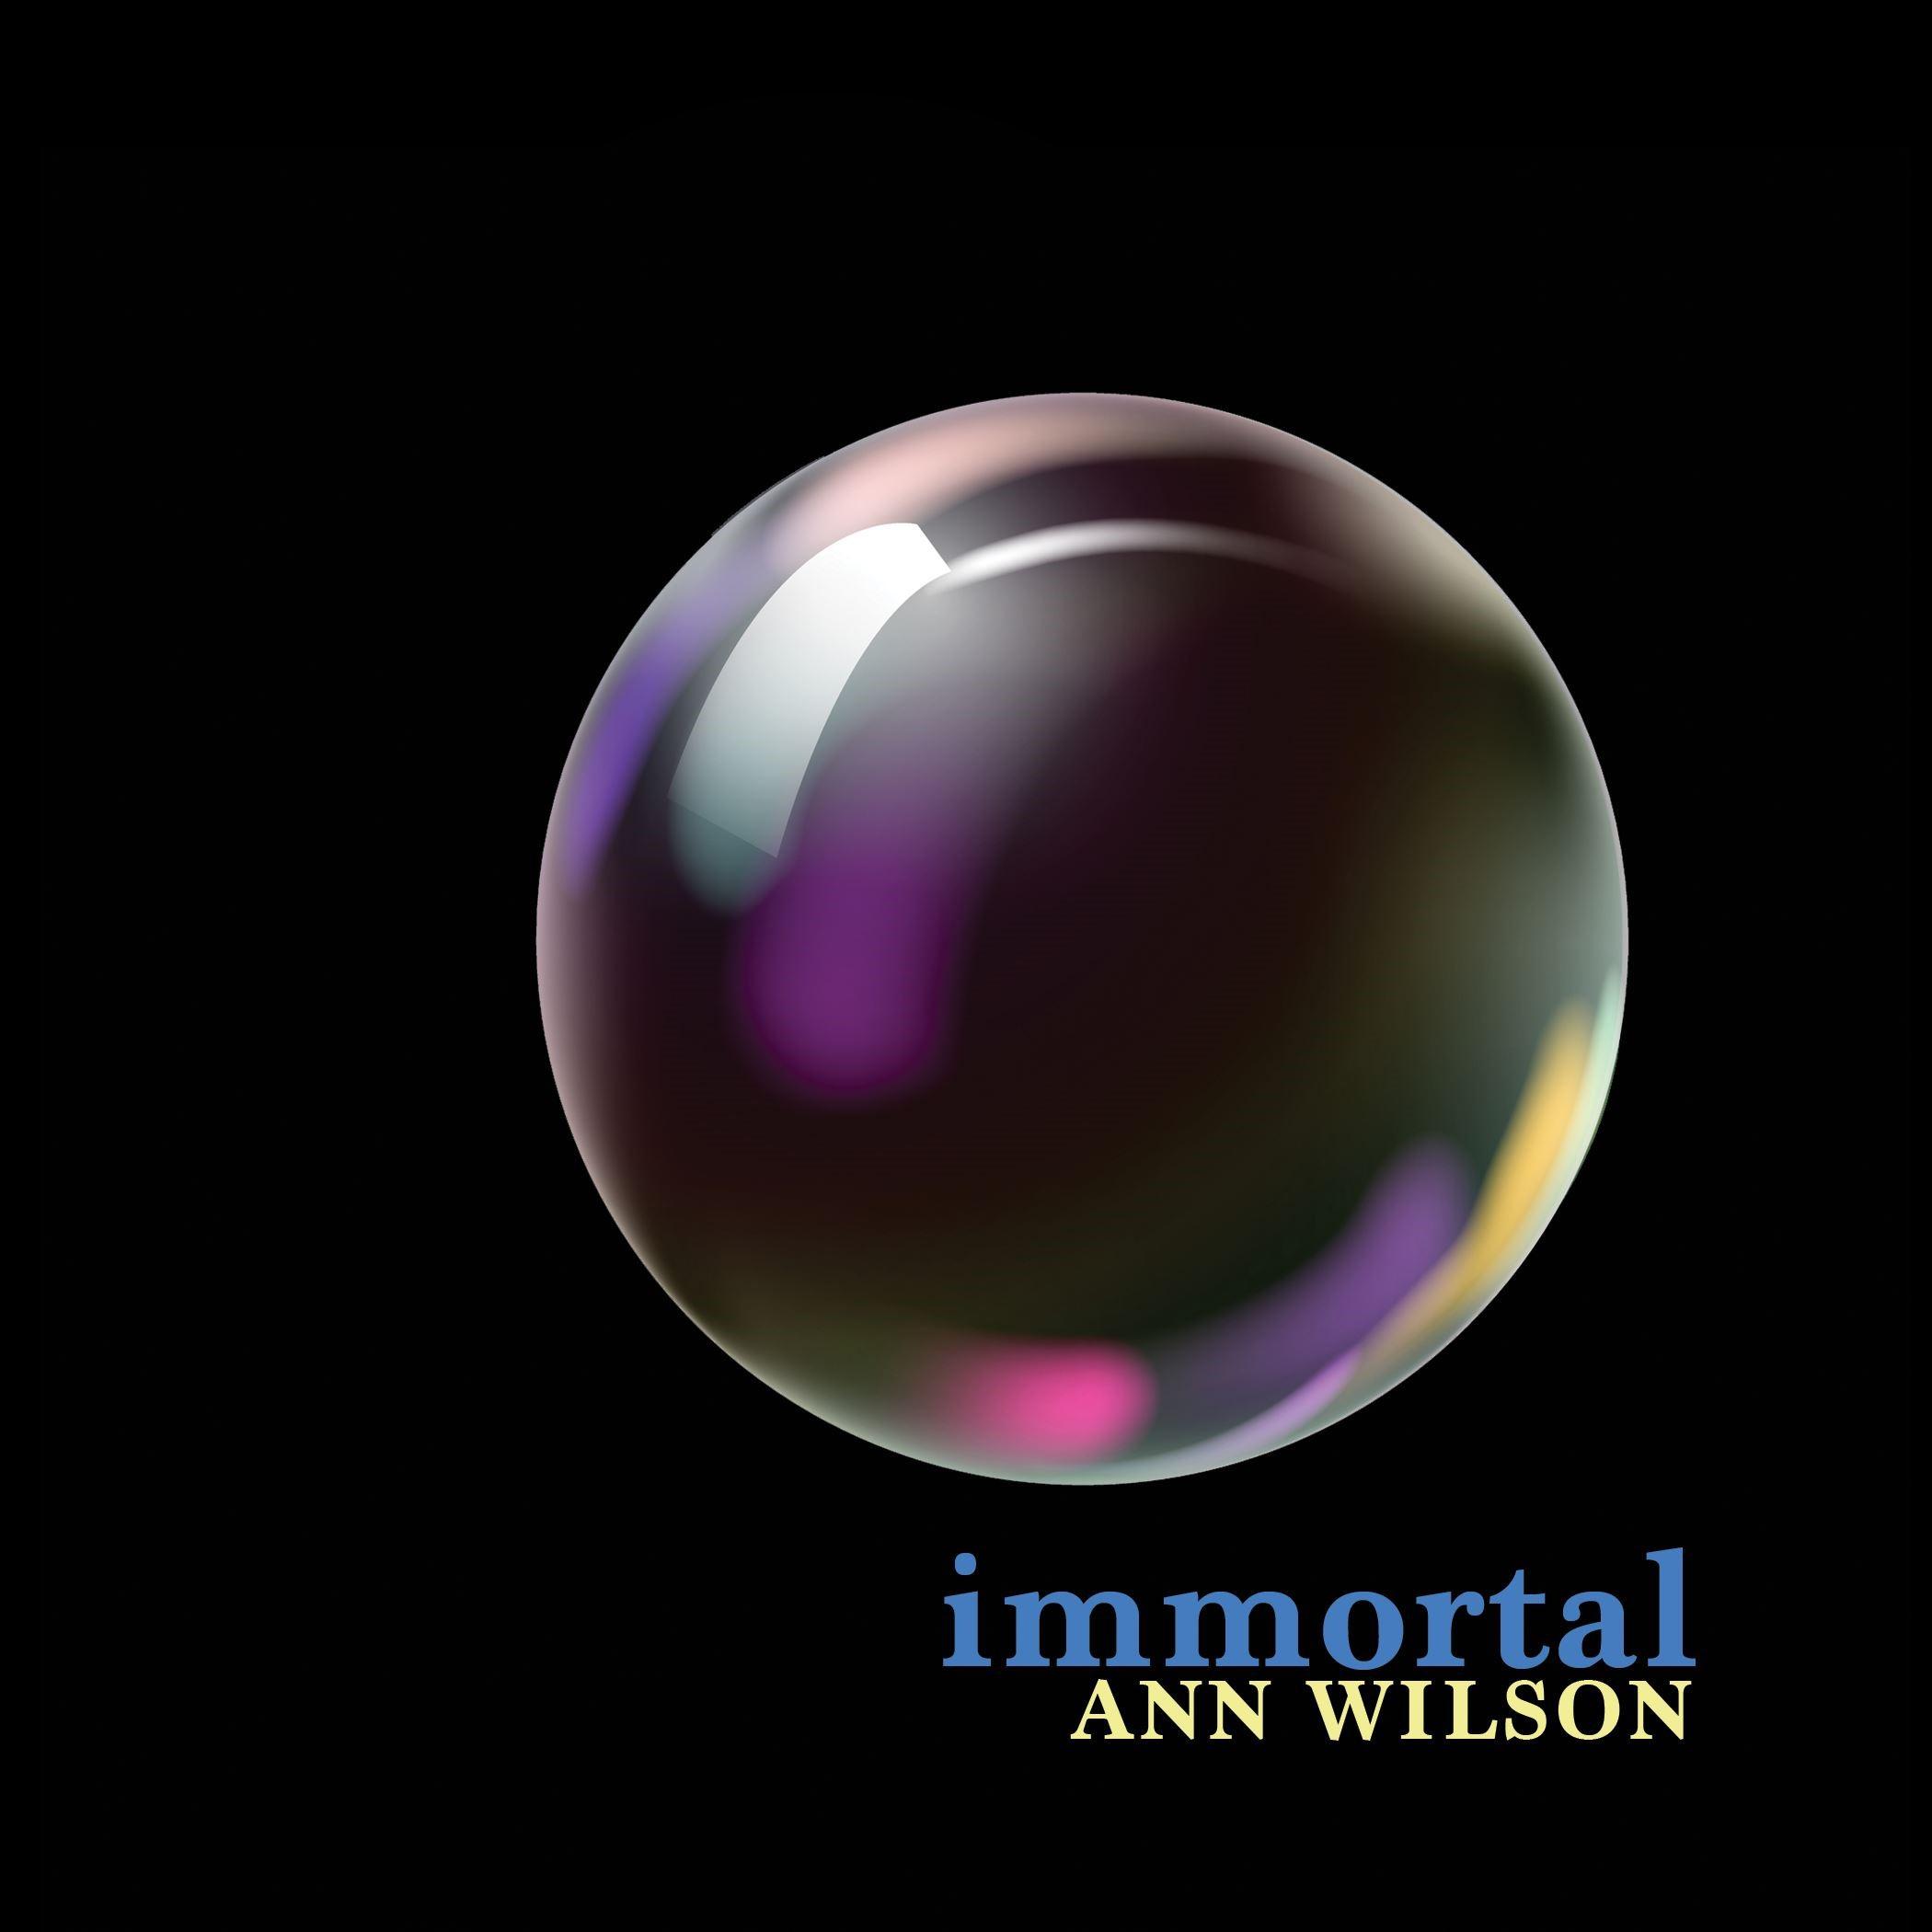 Review: Ann Wilson - Immortal